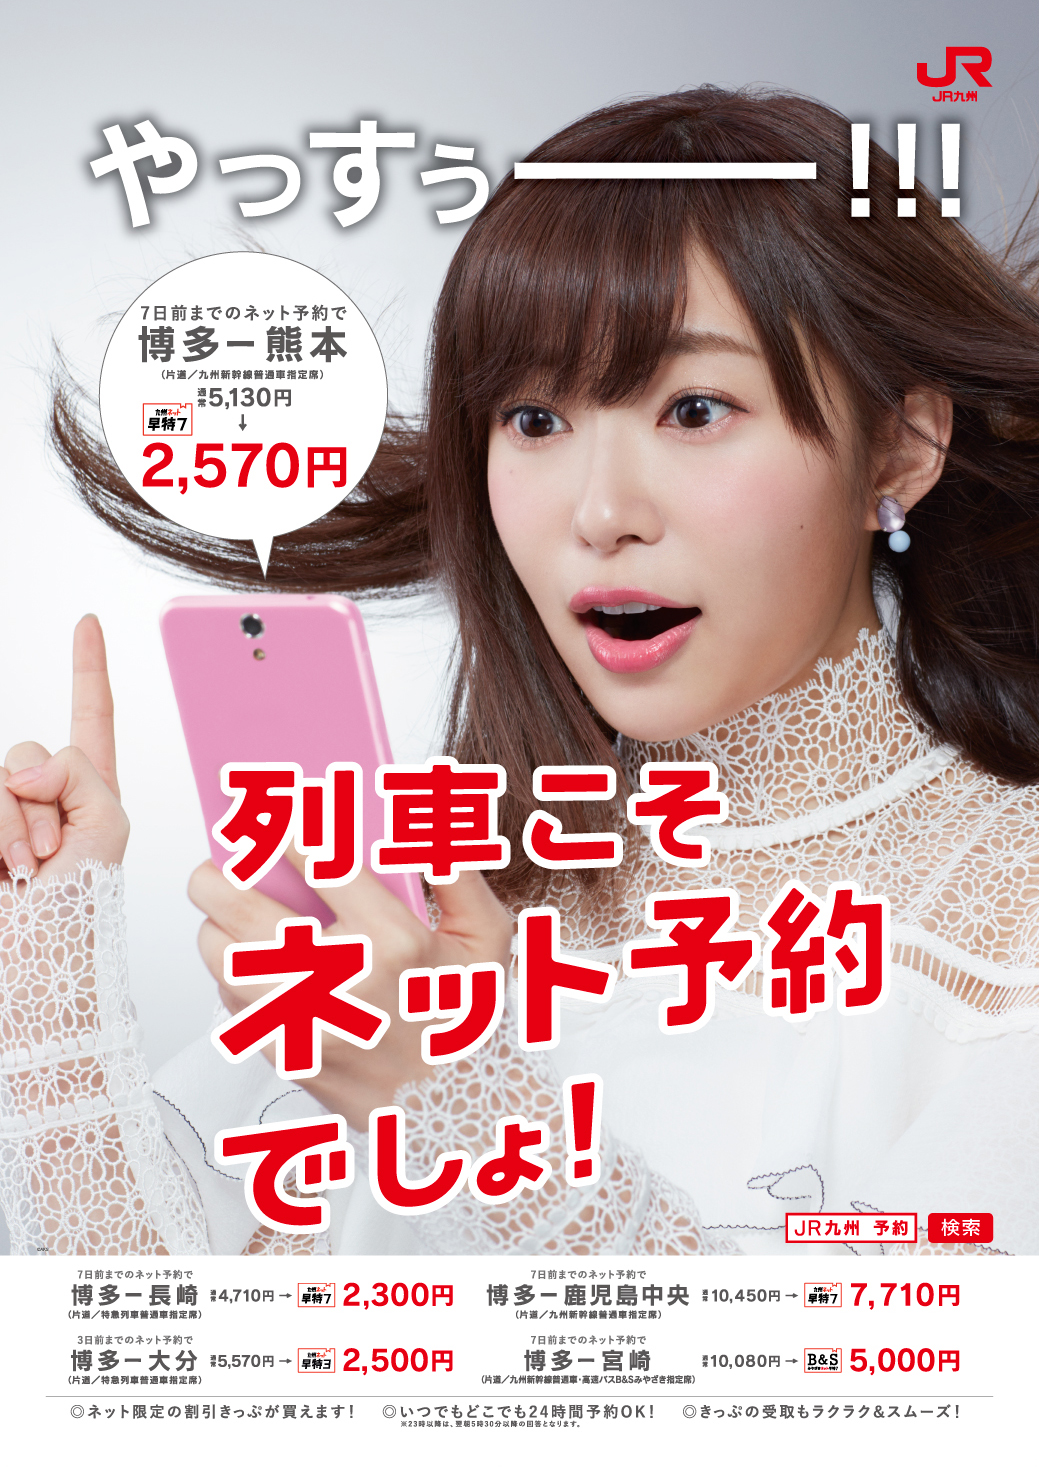 Jr九州: JR九州のイメージキャラクターに就任!